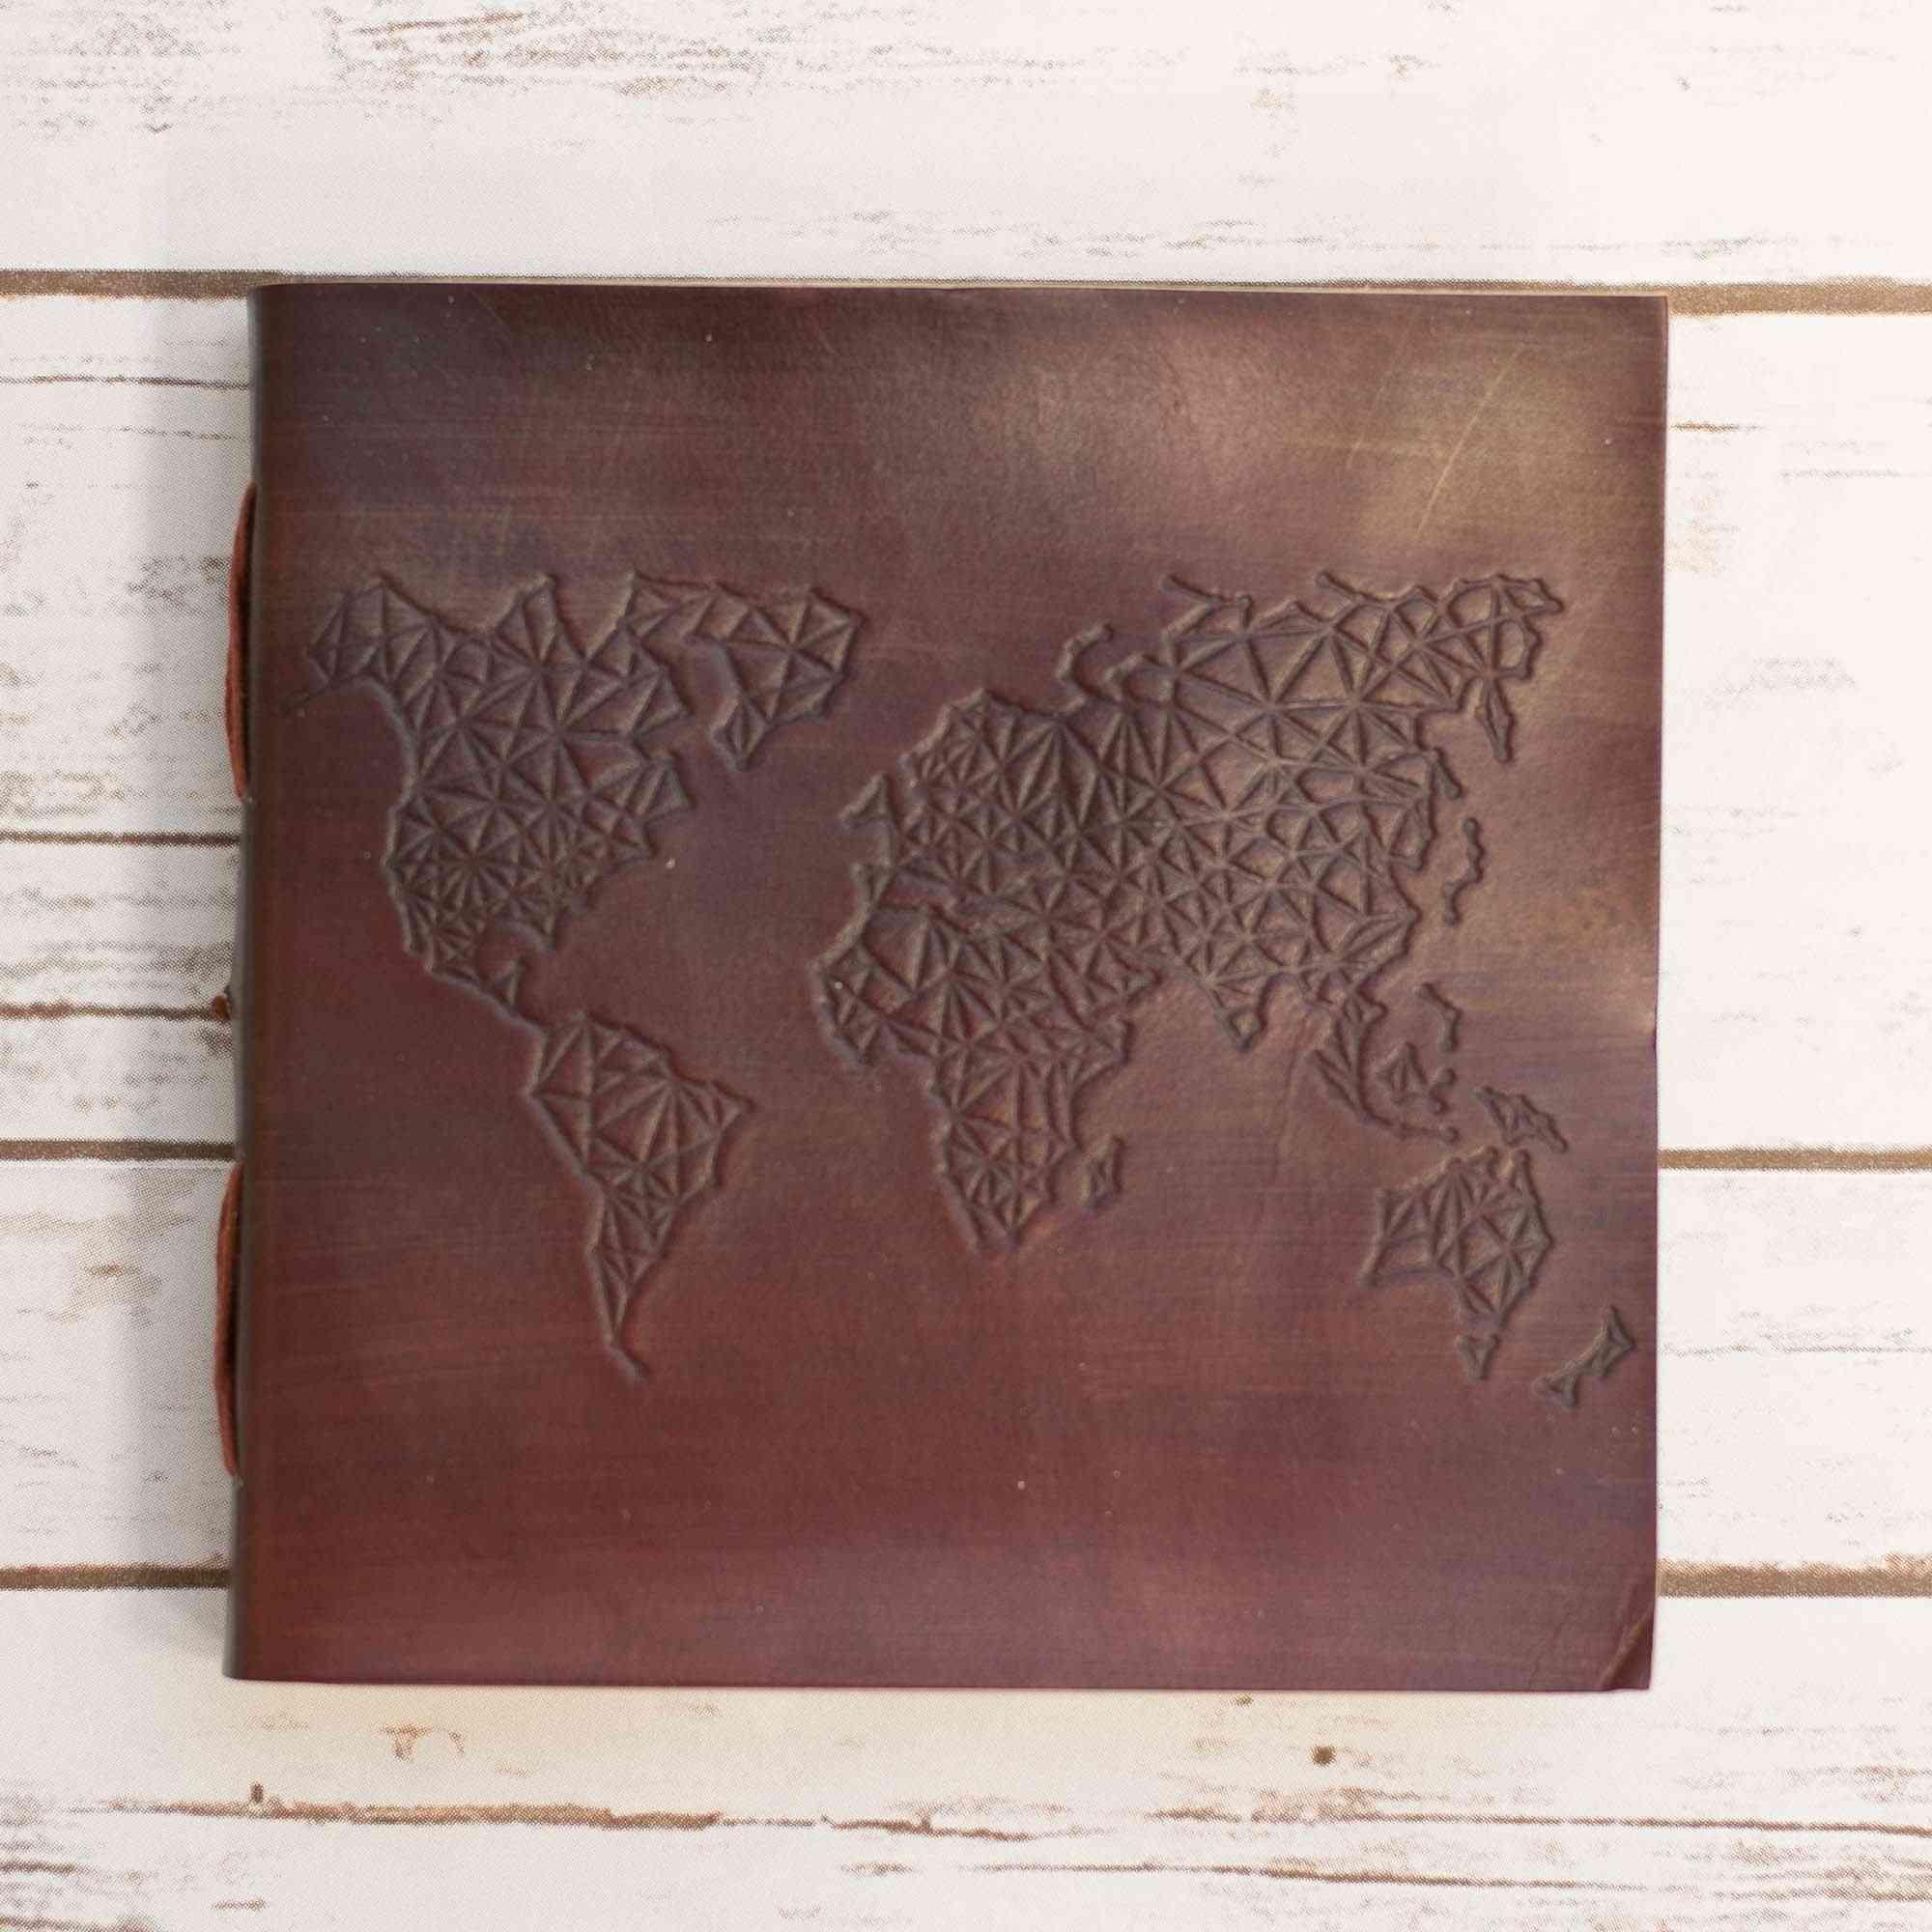 World Map Design Square Handmade Leather Journal